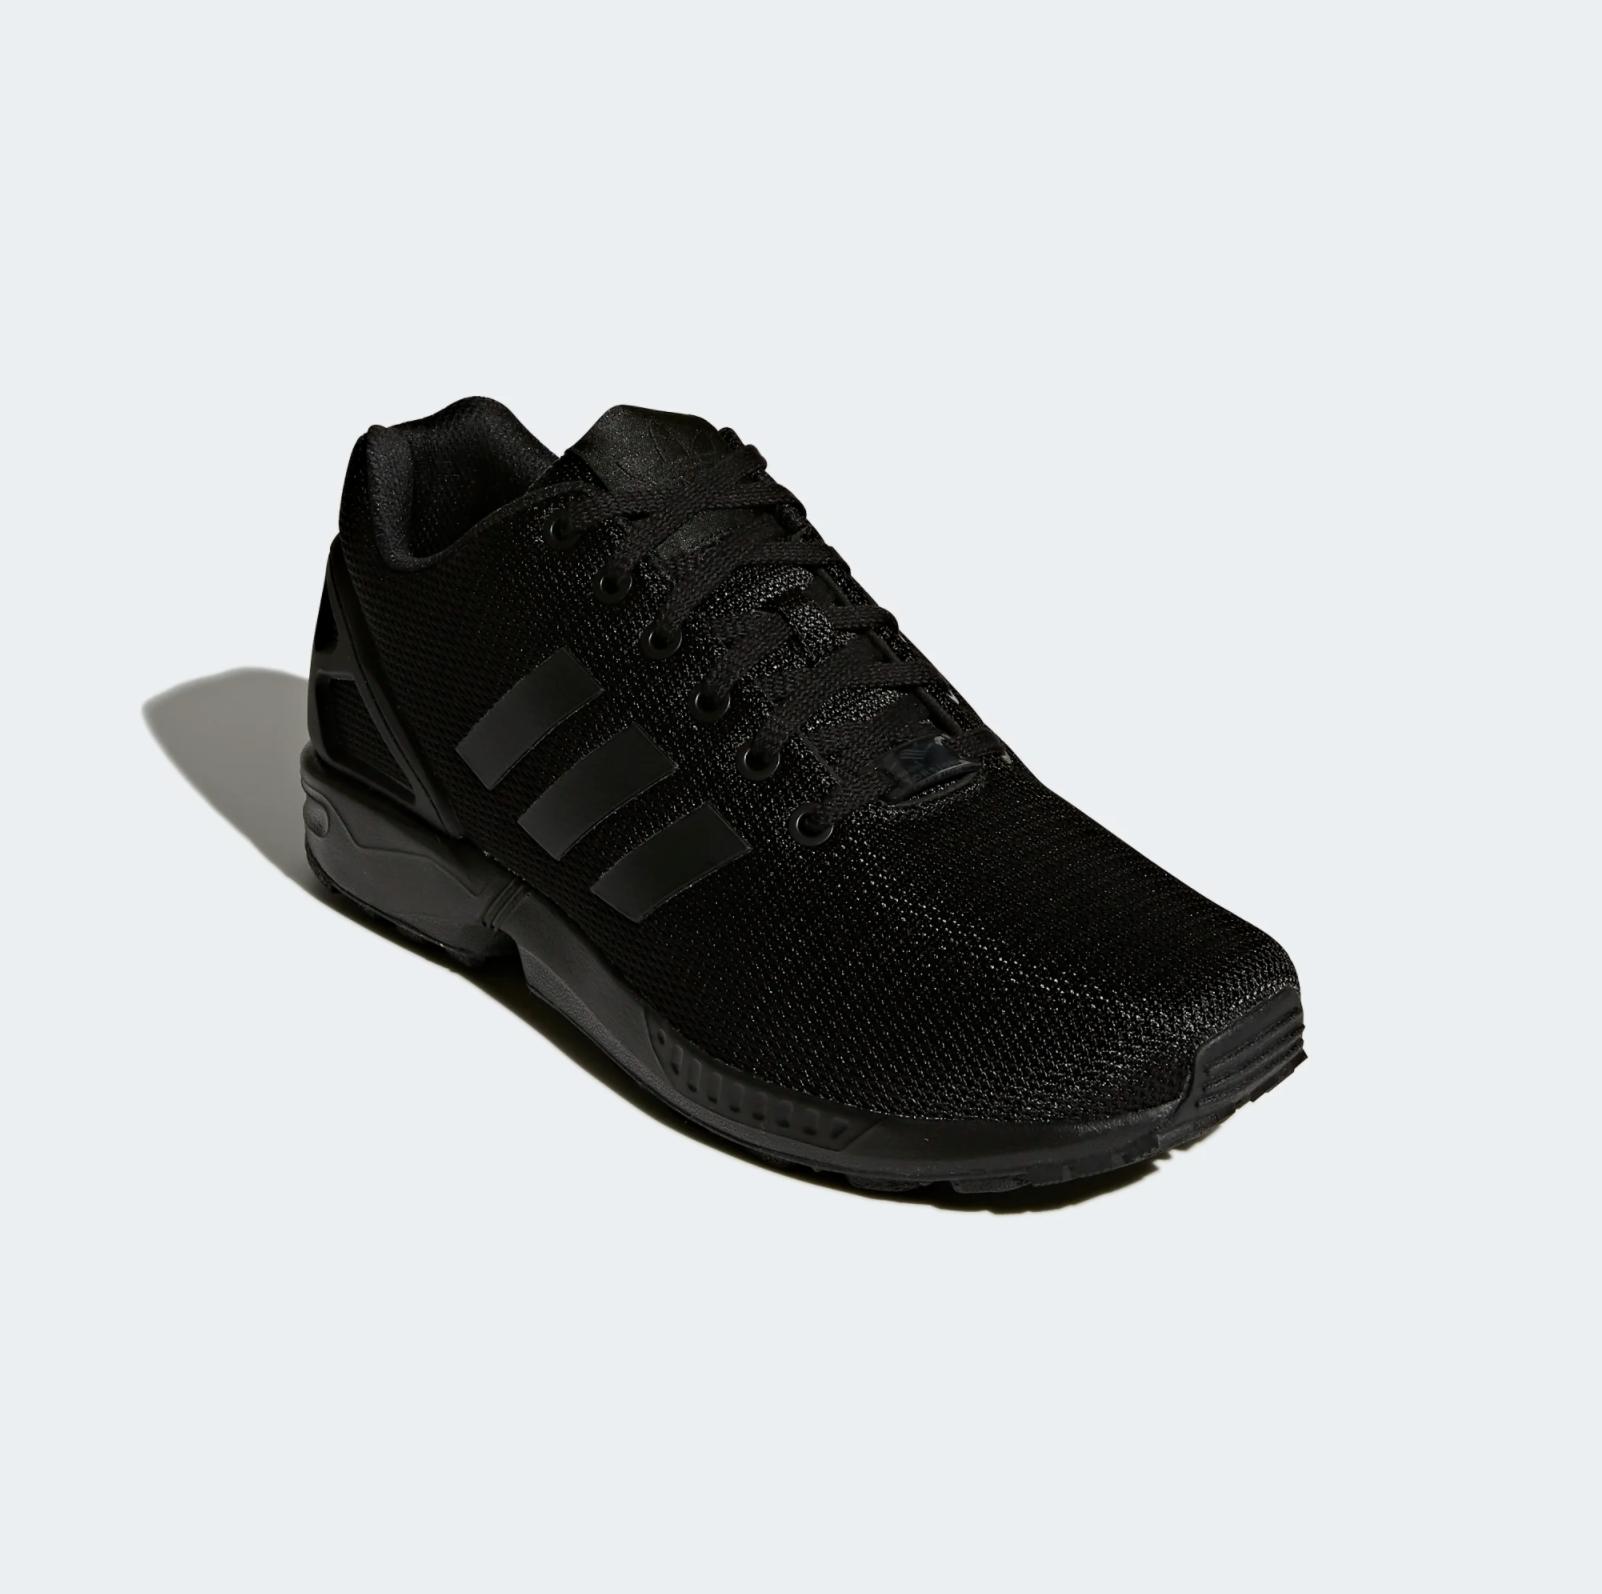 adidas zx flux kinder 29